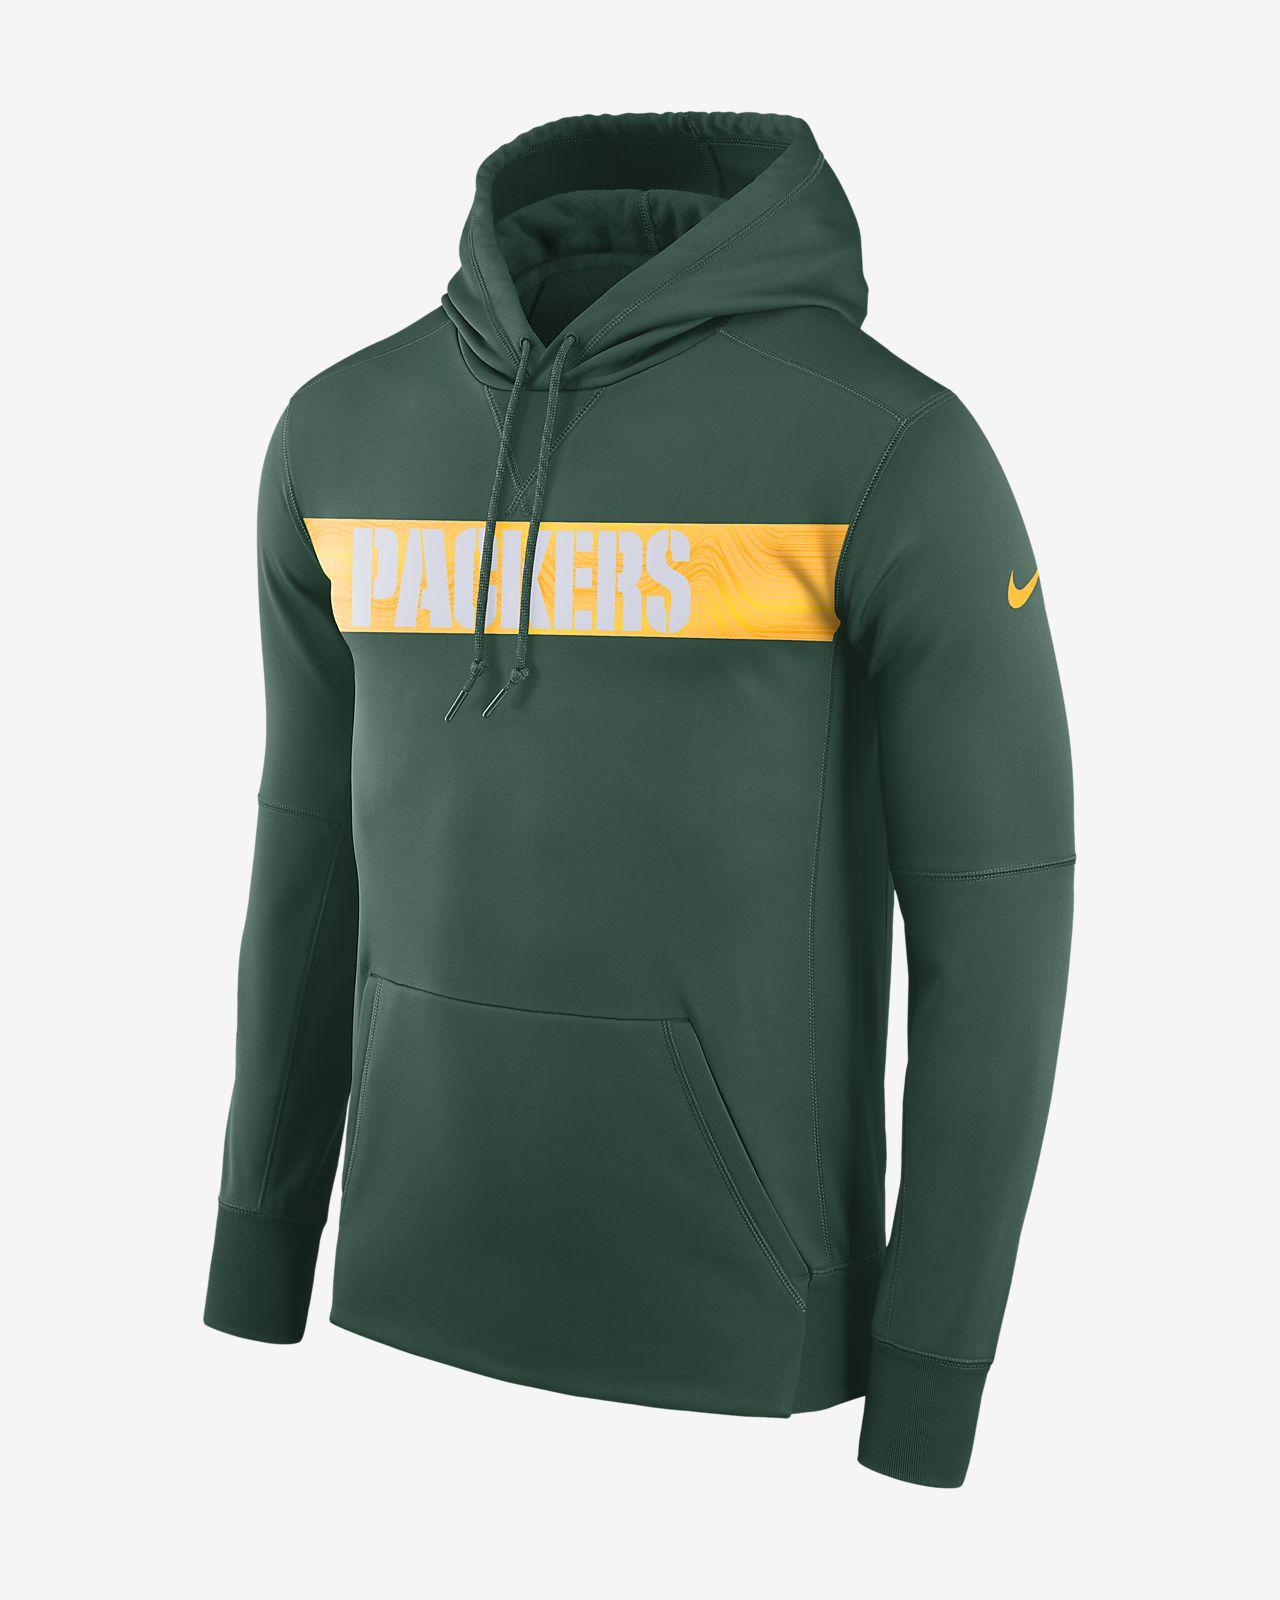 Nike Dri-FIT Therma (NFL Packers) Erkek Kapüşonlu Sweatshirt'ü